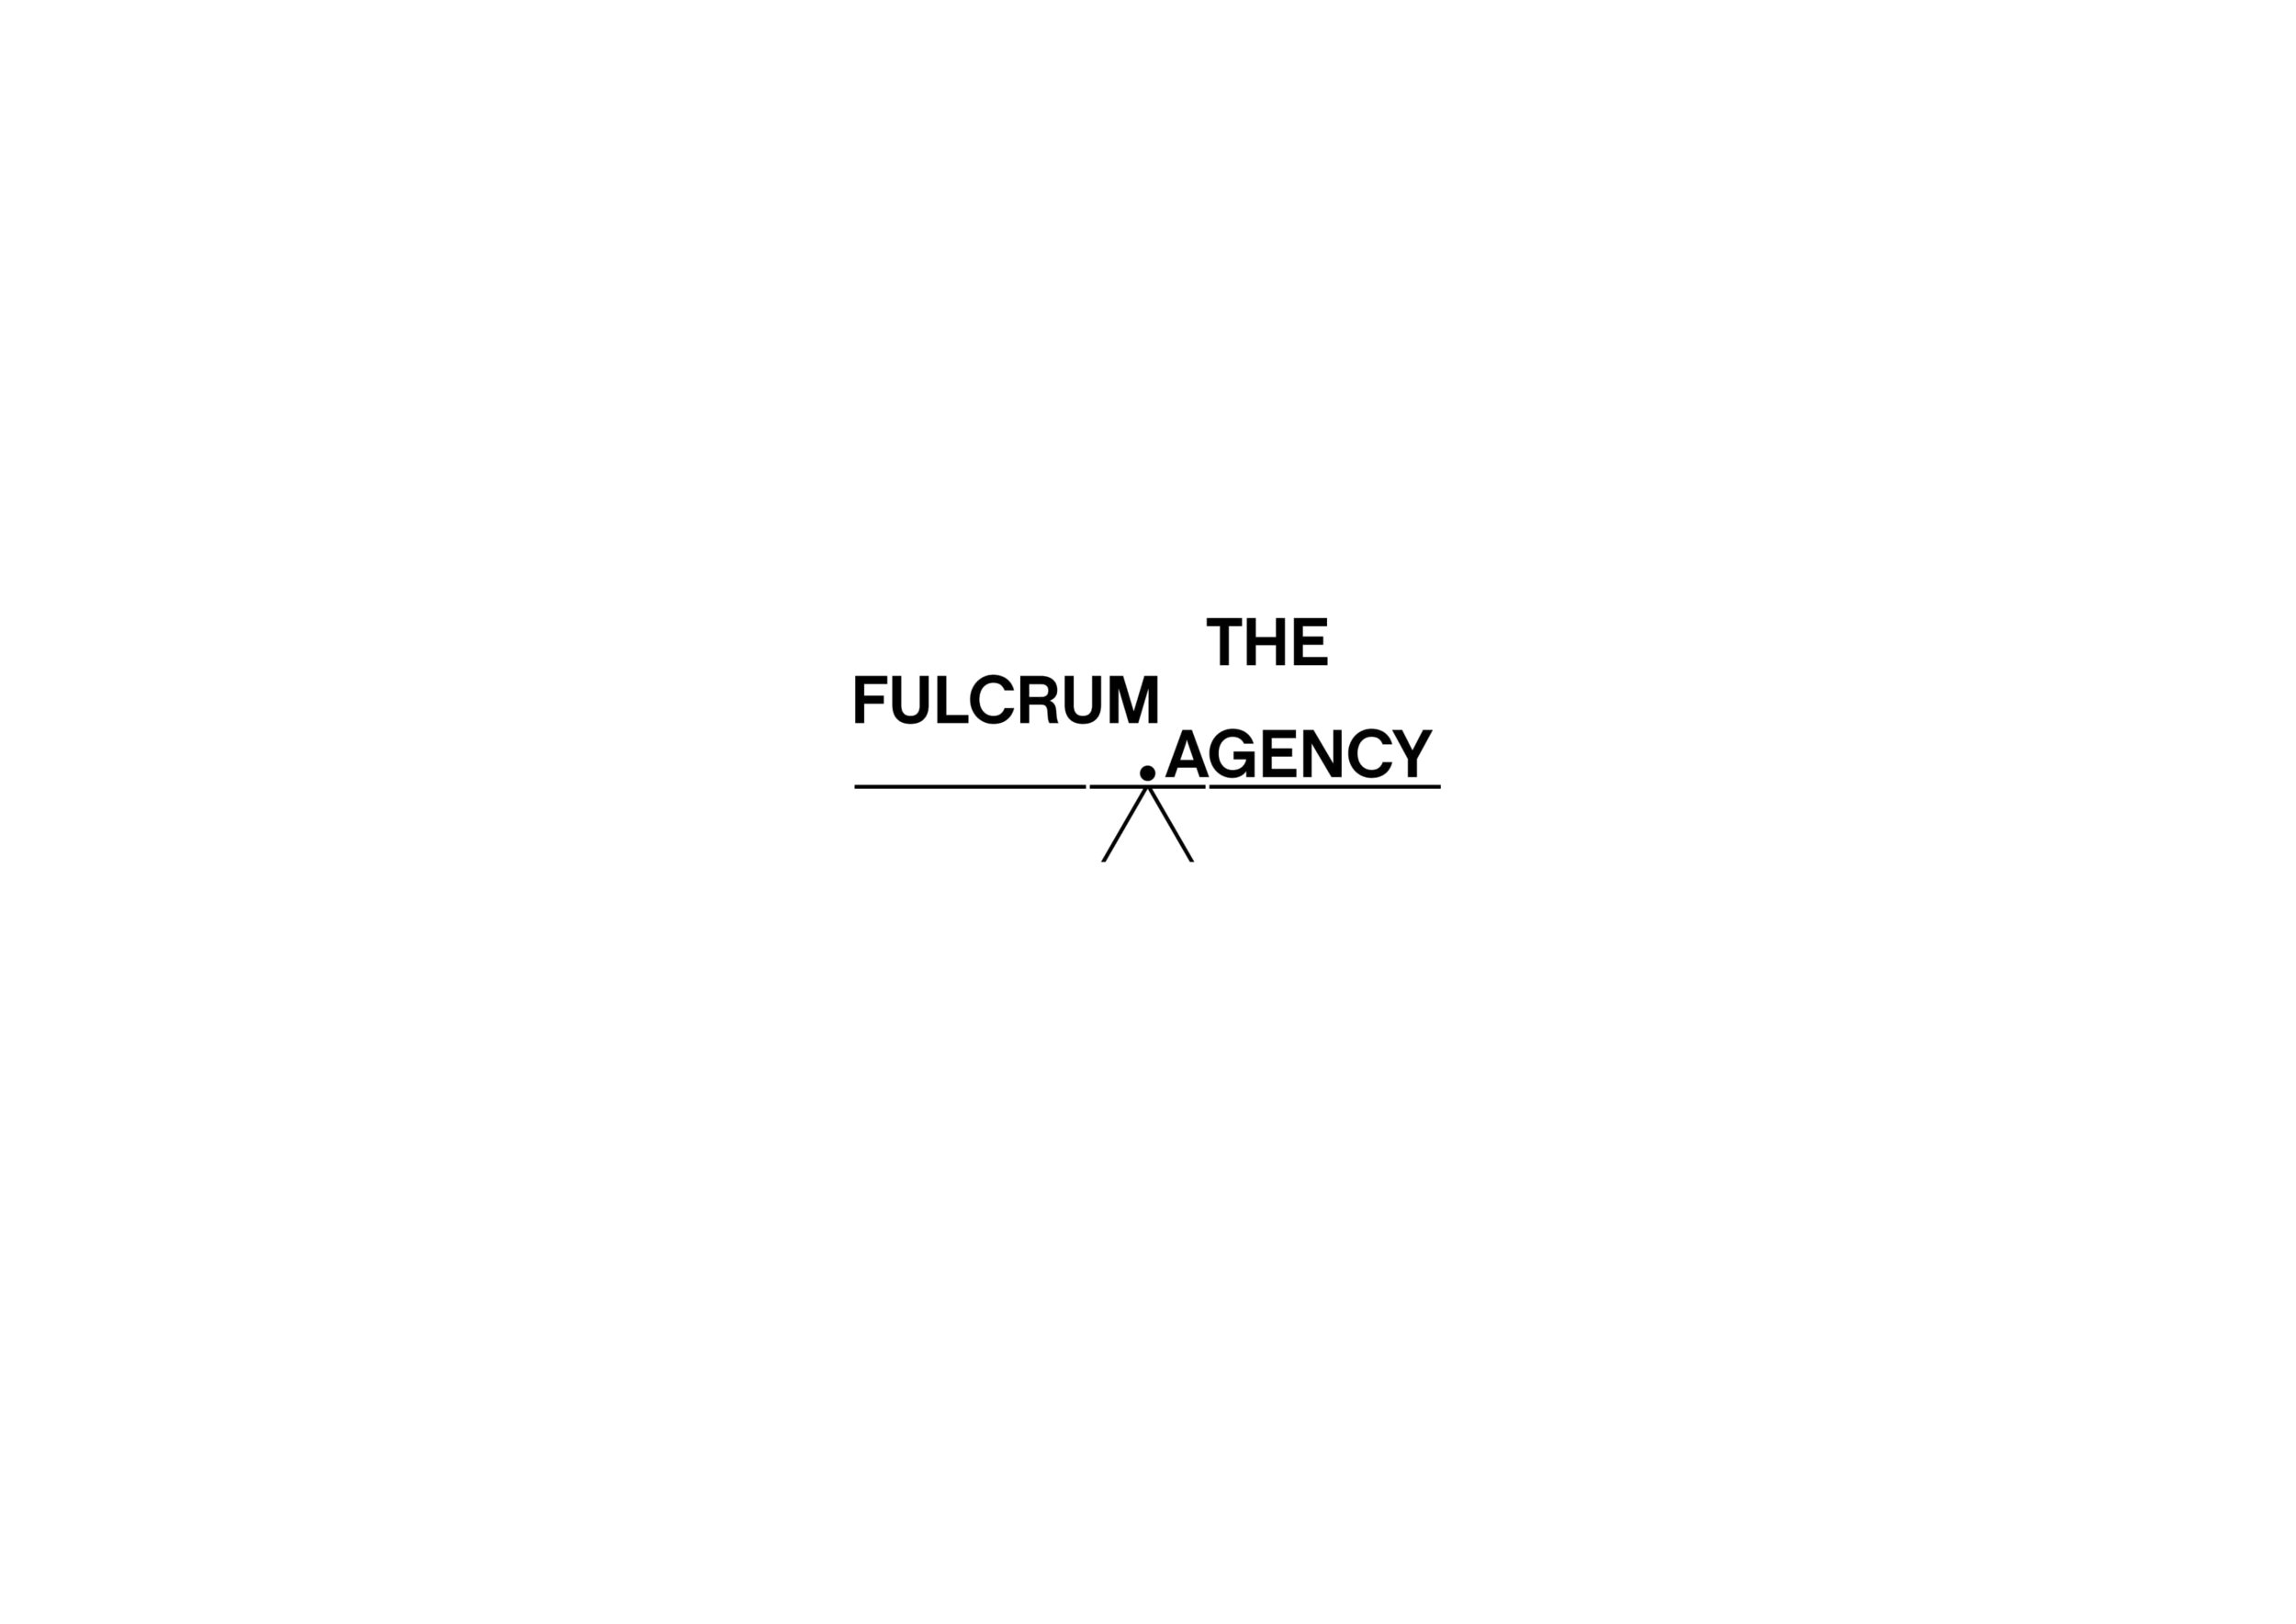 190207 FULCRUM CONCEPT WIP-17.jpg